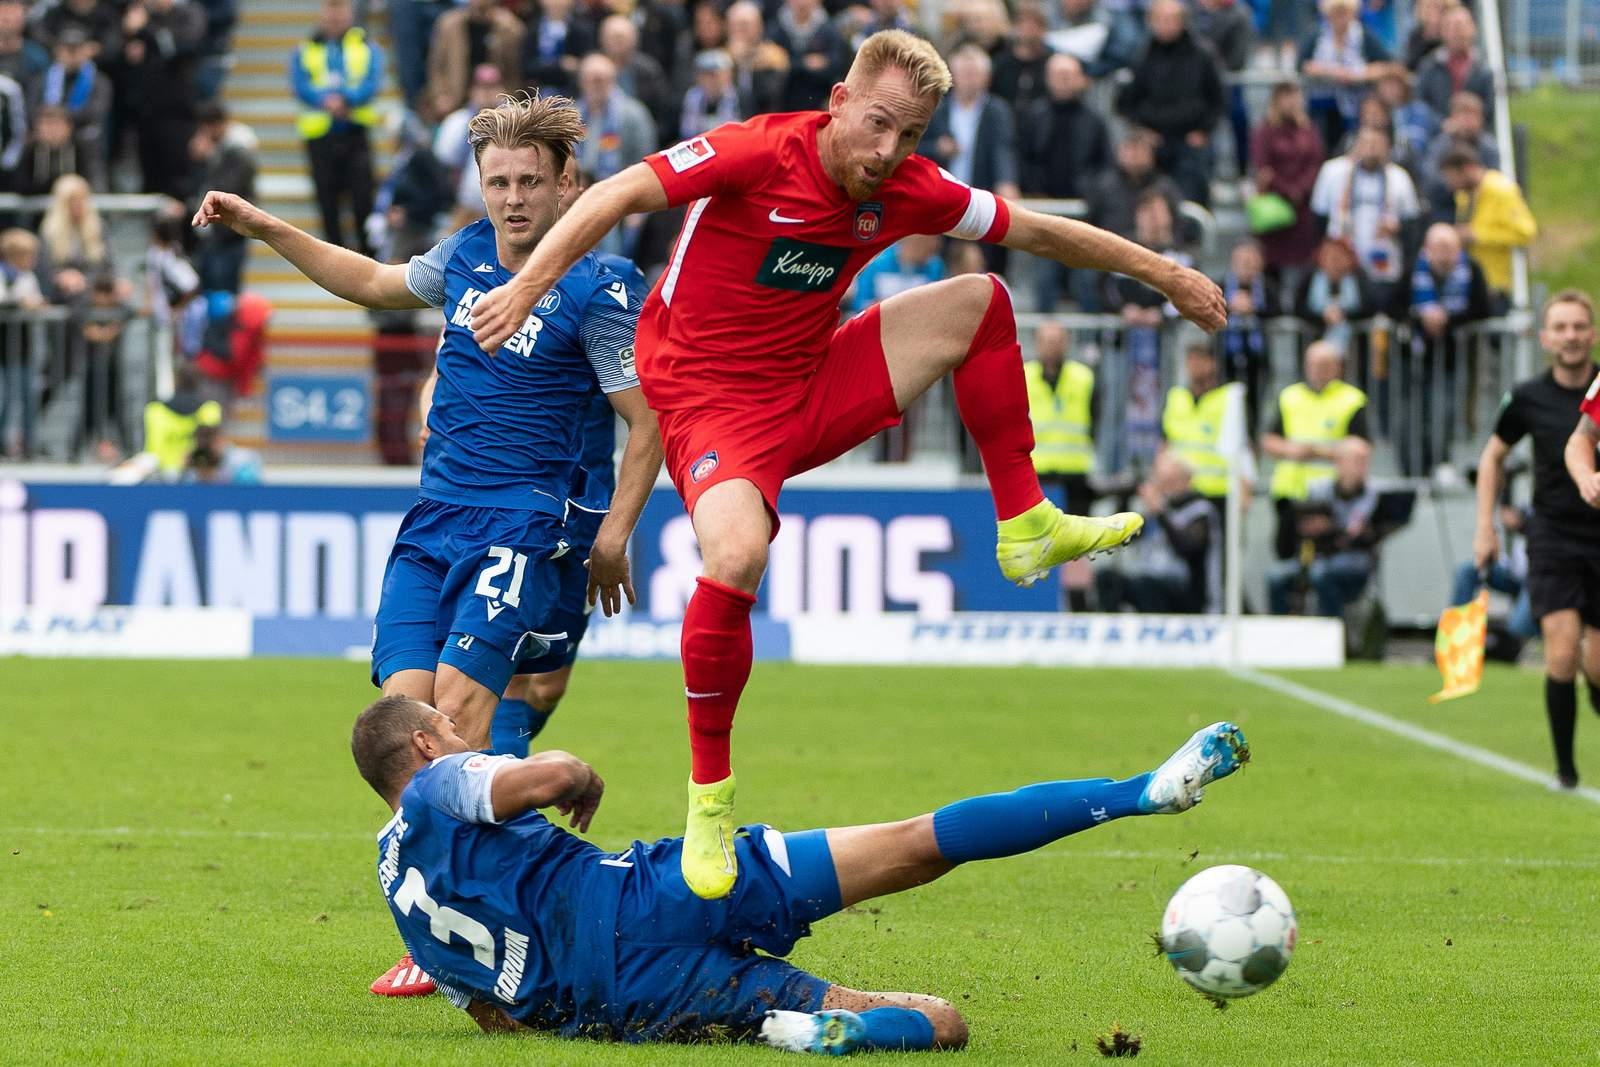 Marc Schnatterer überspringt Karlsruhes Daniel Gordon.